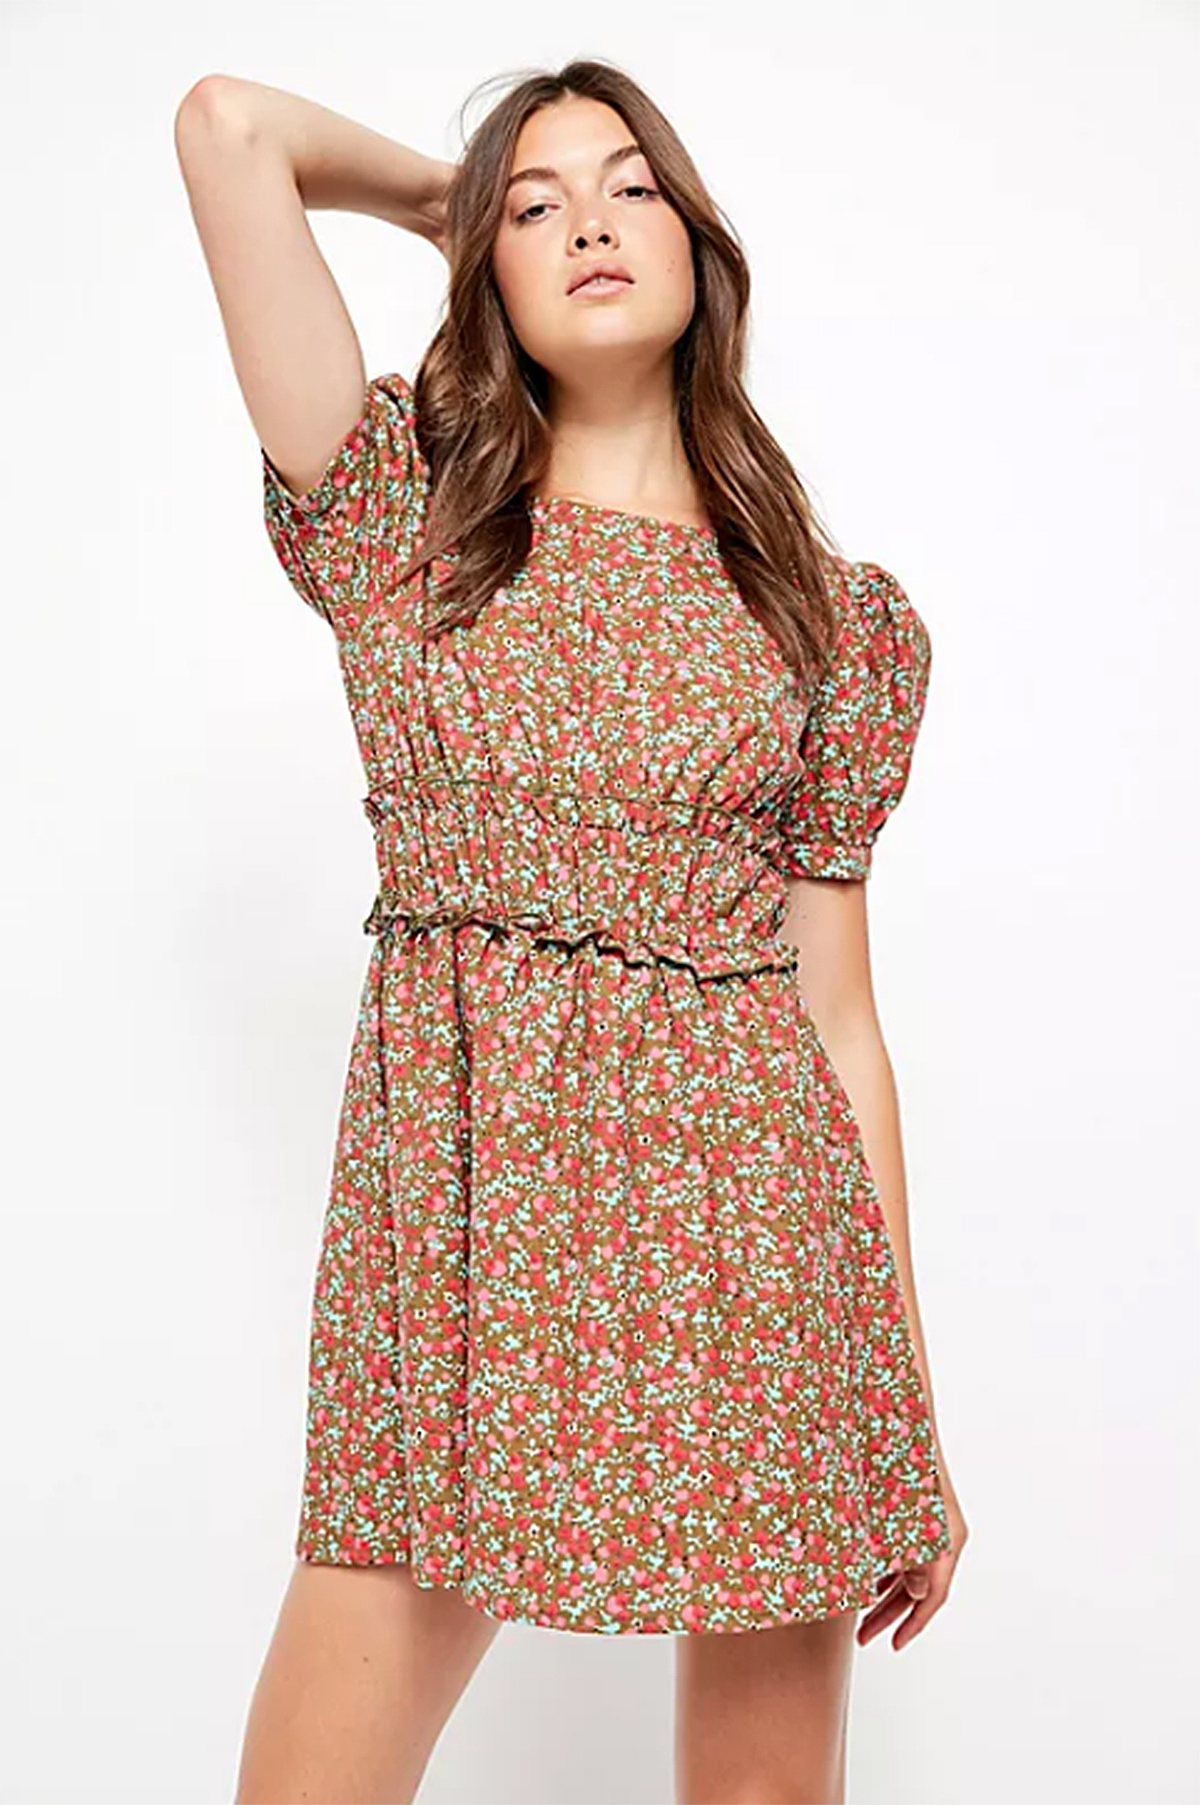 free-people-dress-sale-floral-mini